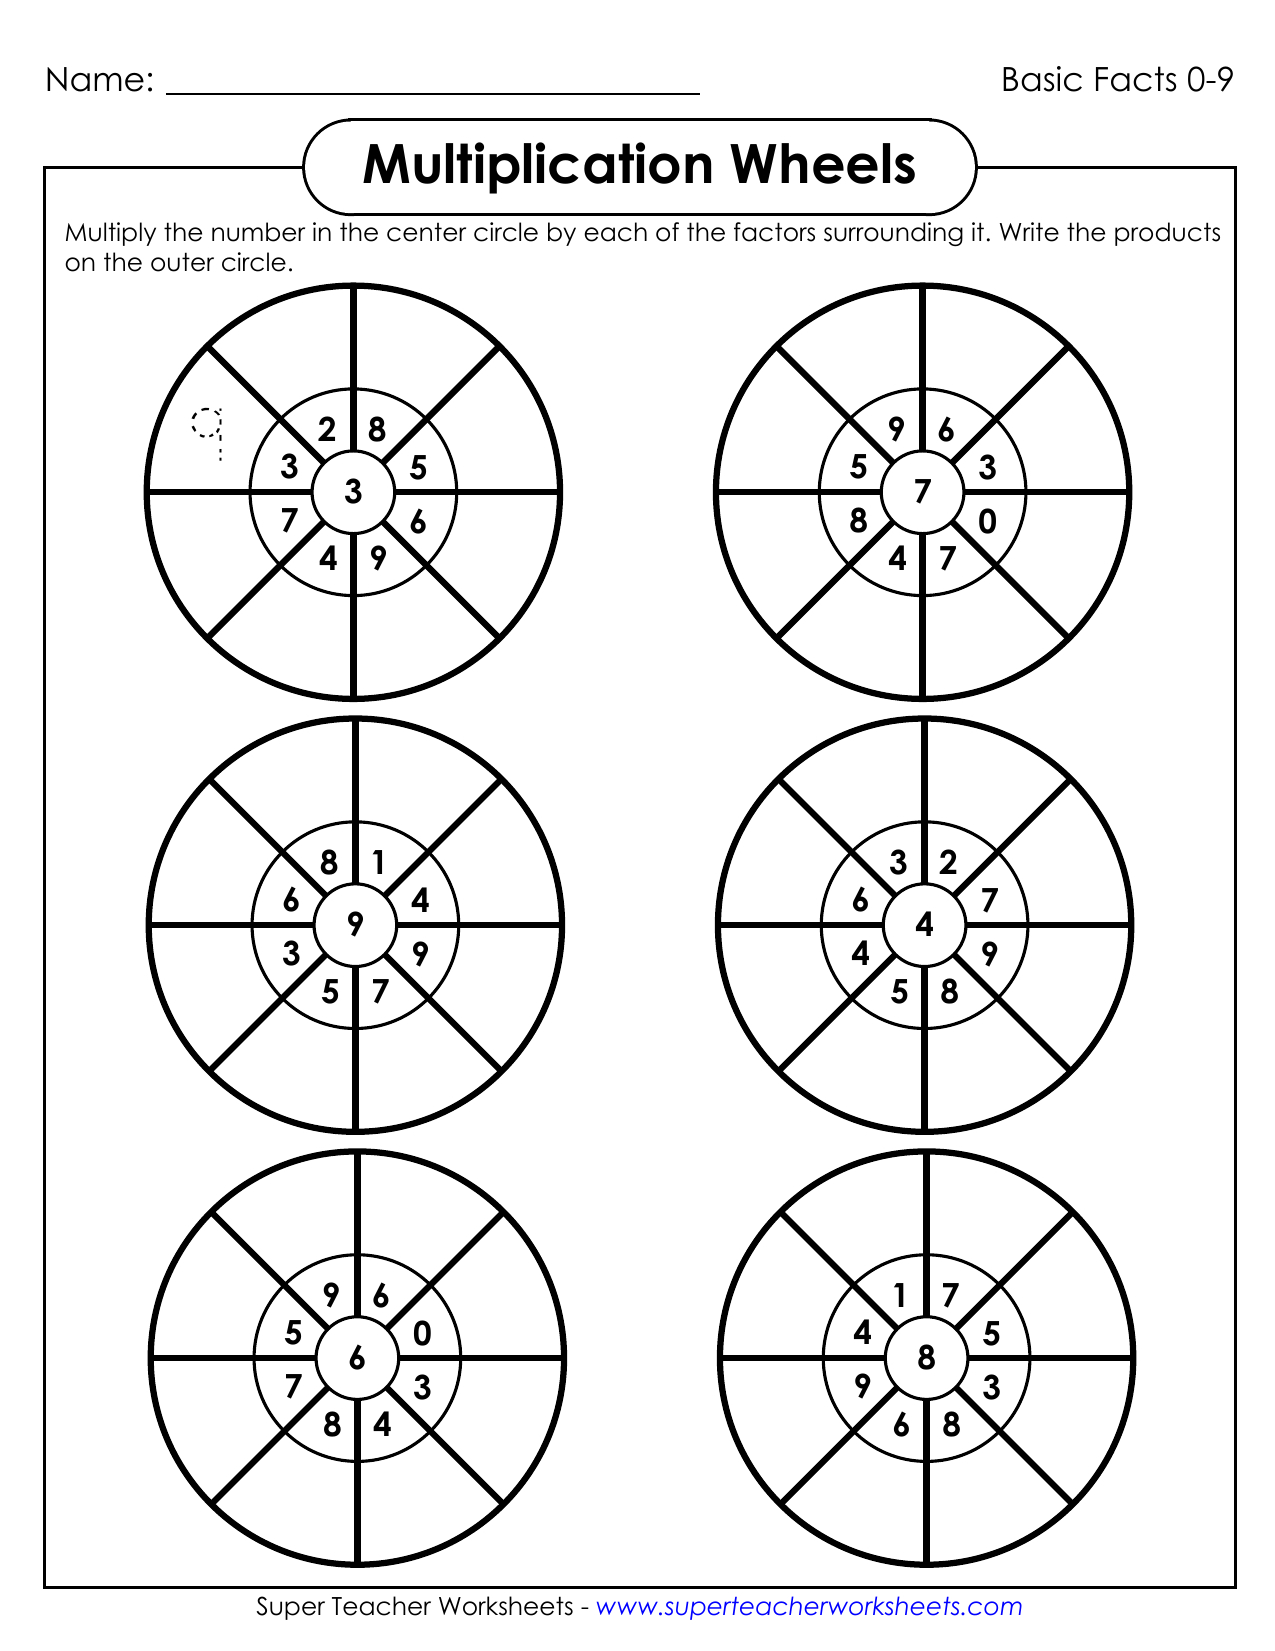 Multiplication Wheels - Super Teacher Worksheets | Manualzz within Printable Multiplication Wheels